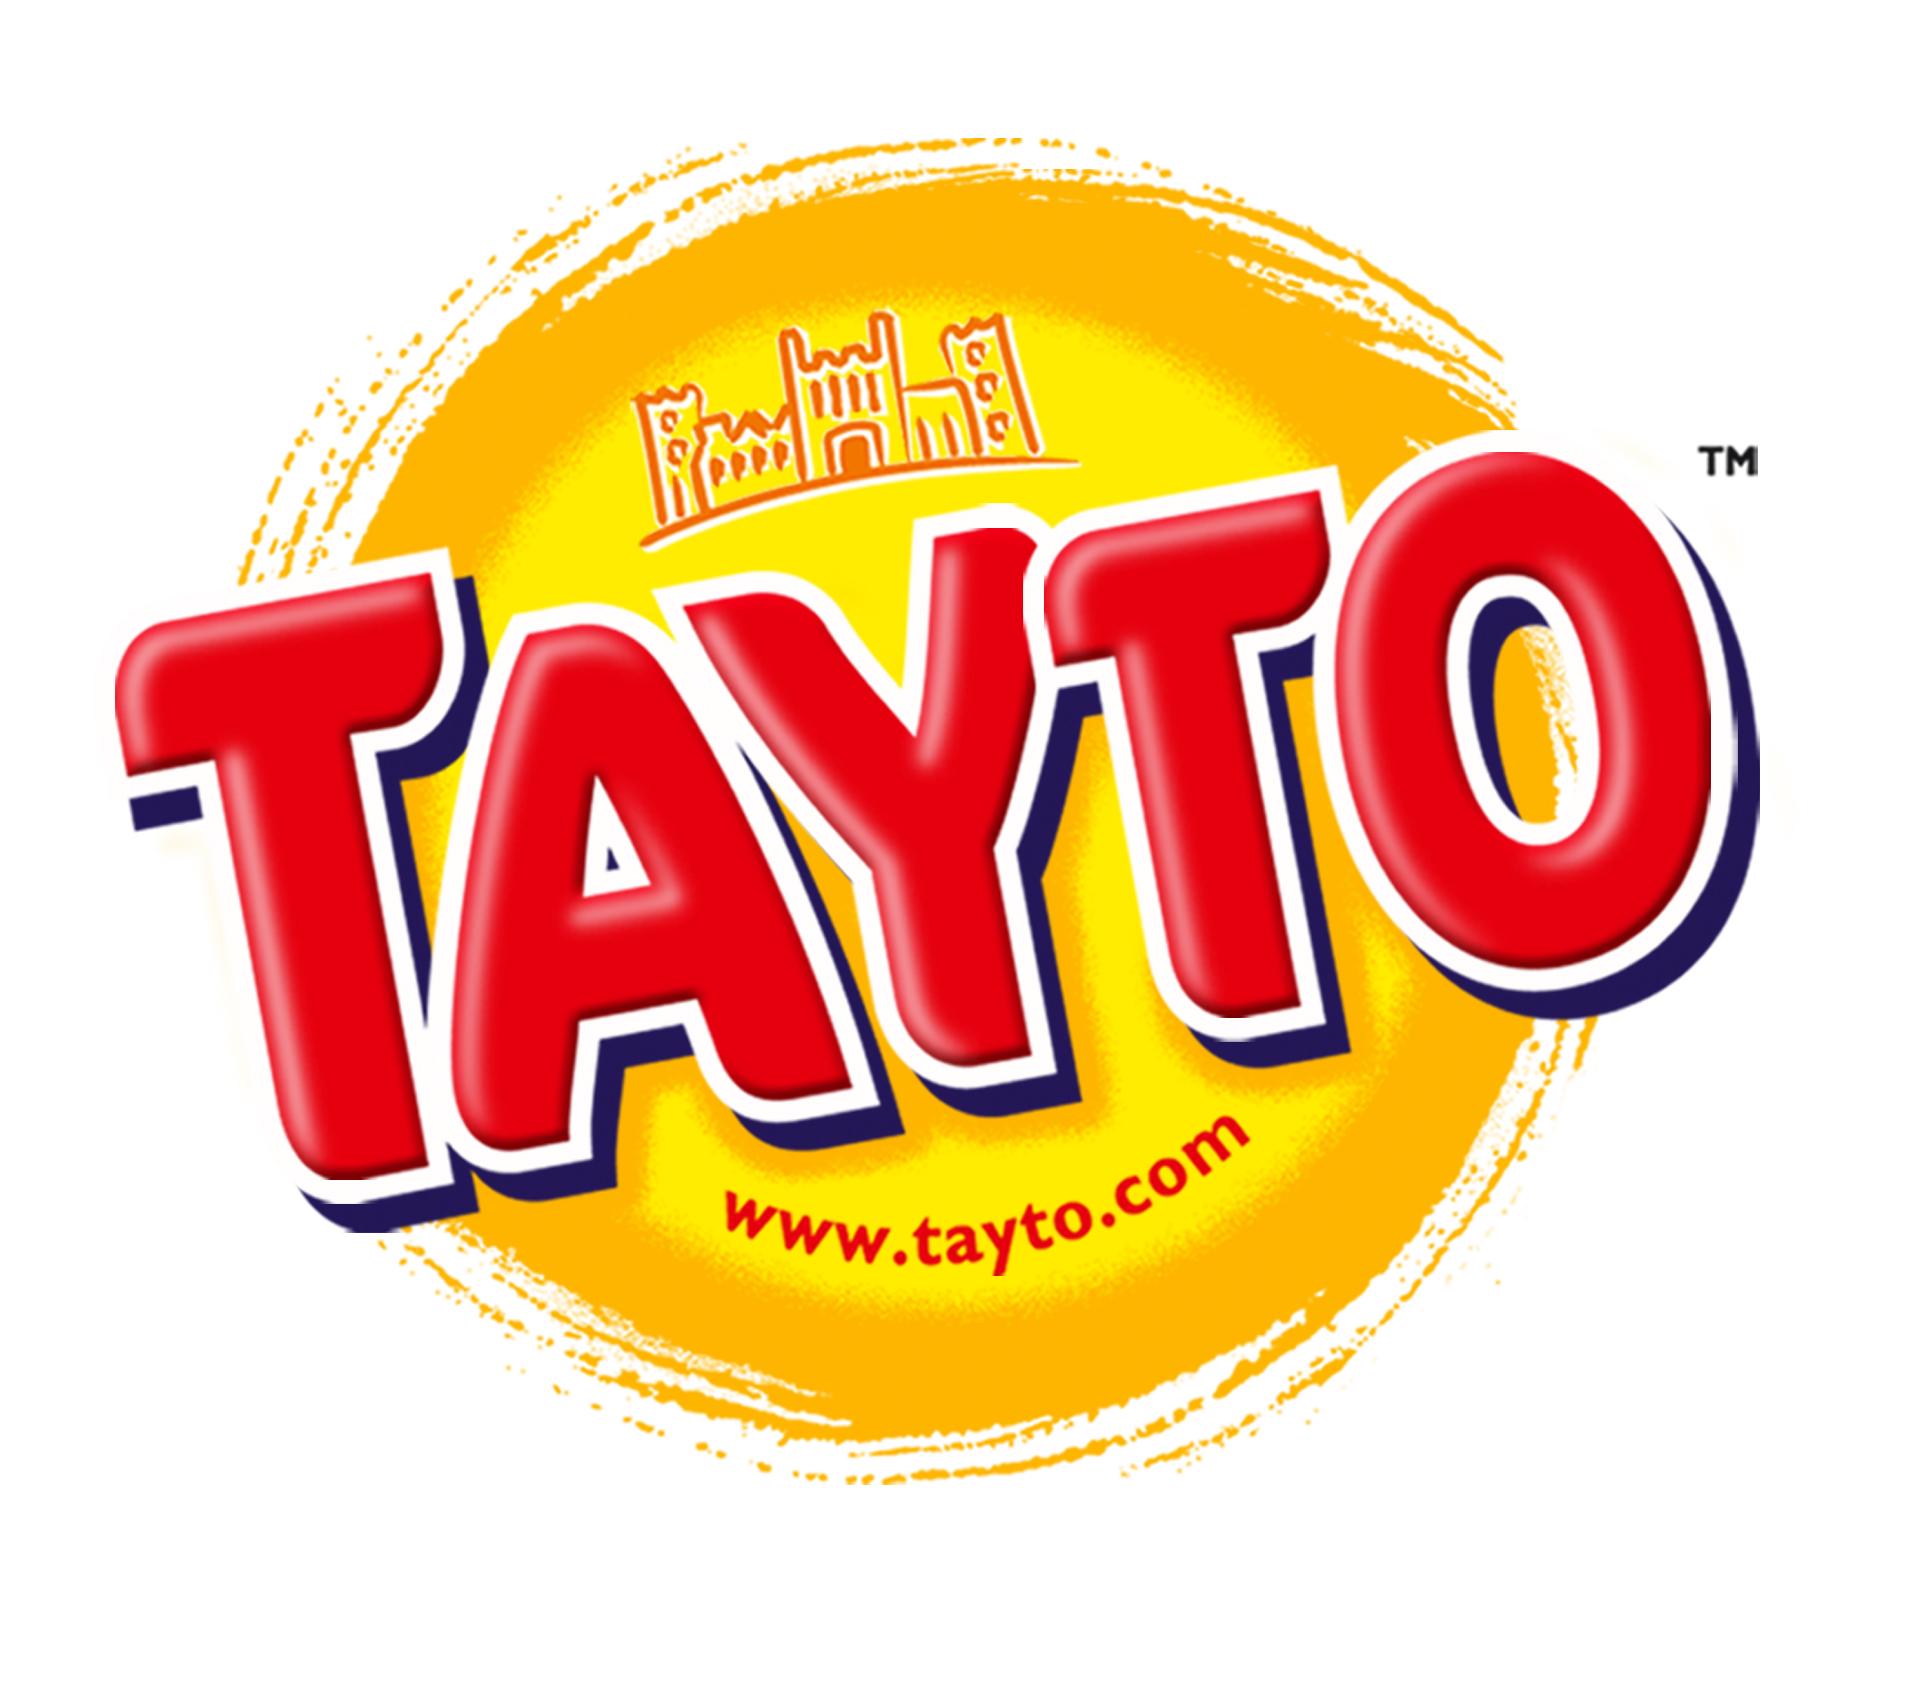 Tayto-HIGHRES-09.jpg